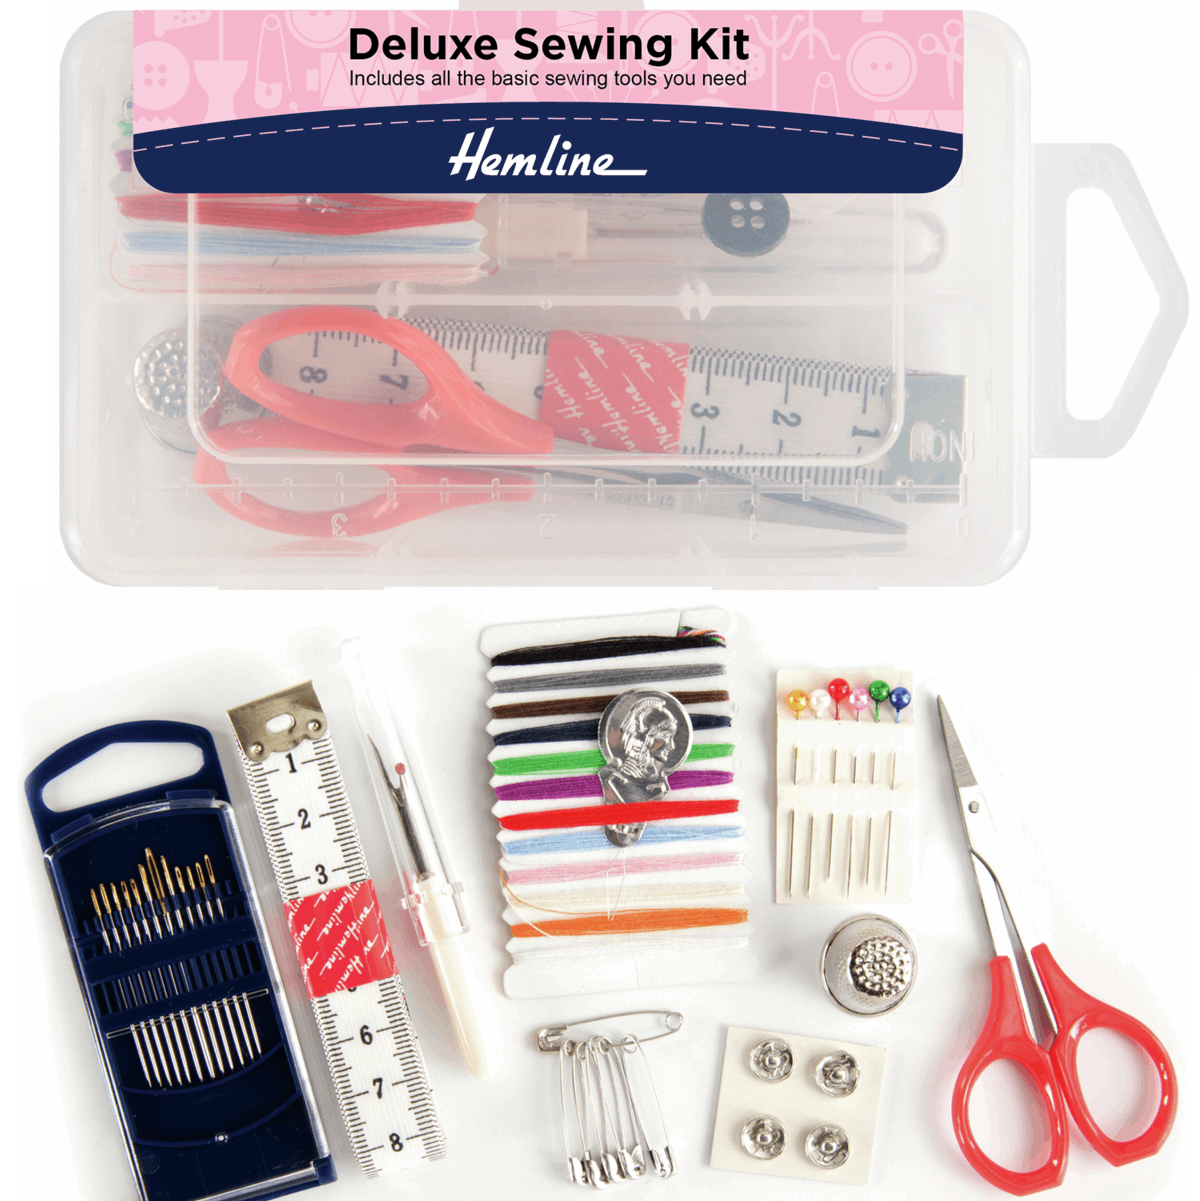 Hemline Deluxe Sewing Kit...